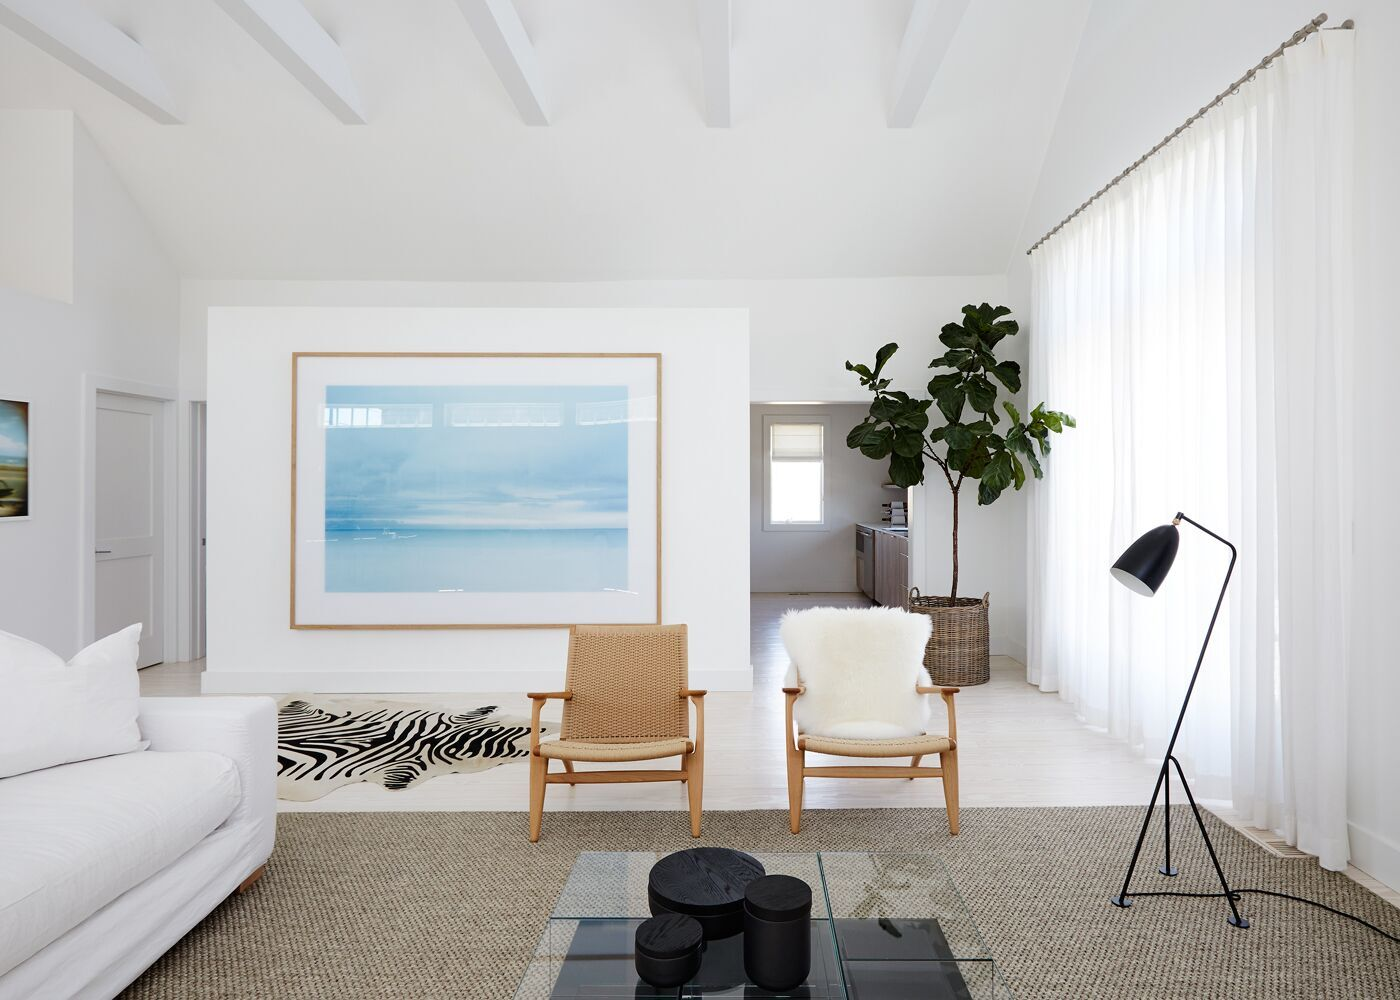 The Interior Hamptons Home